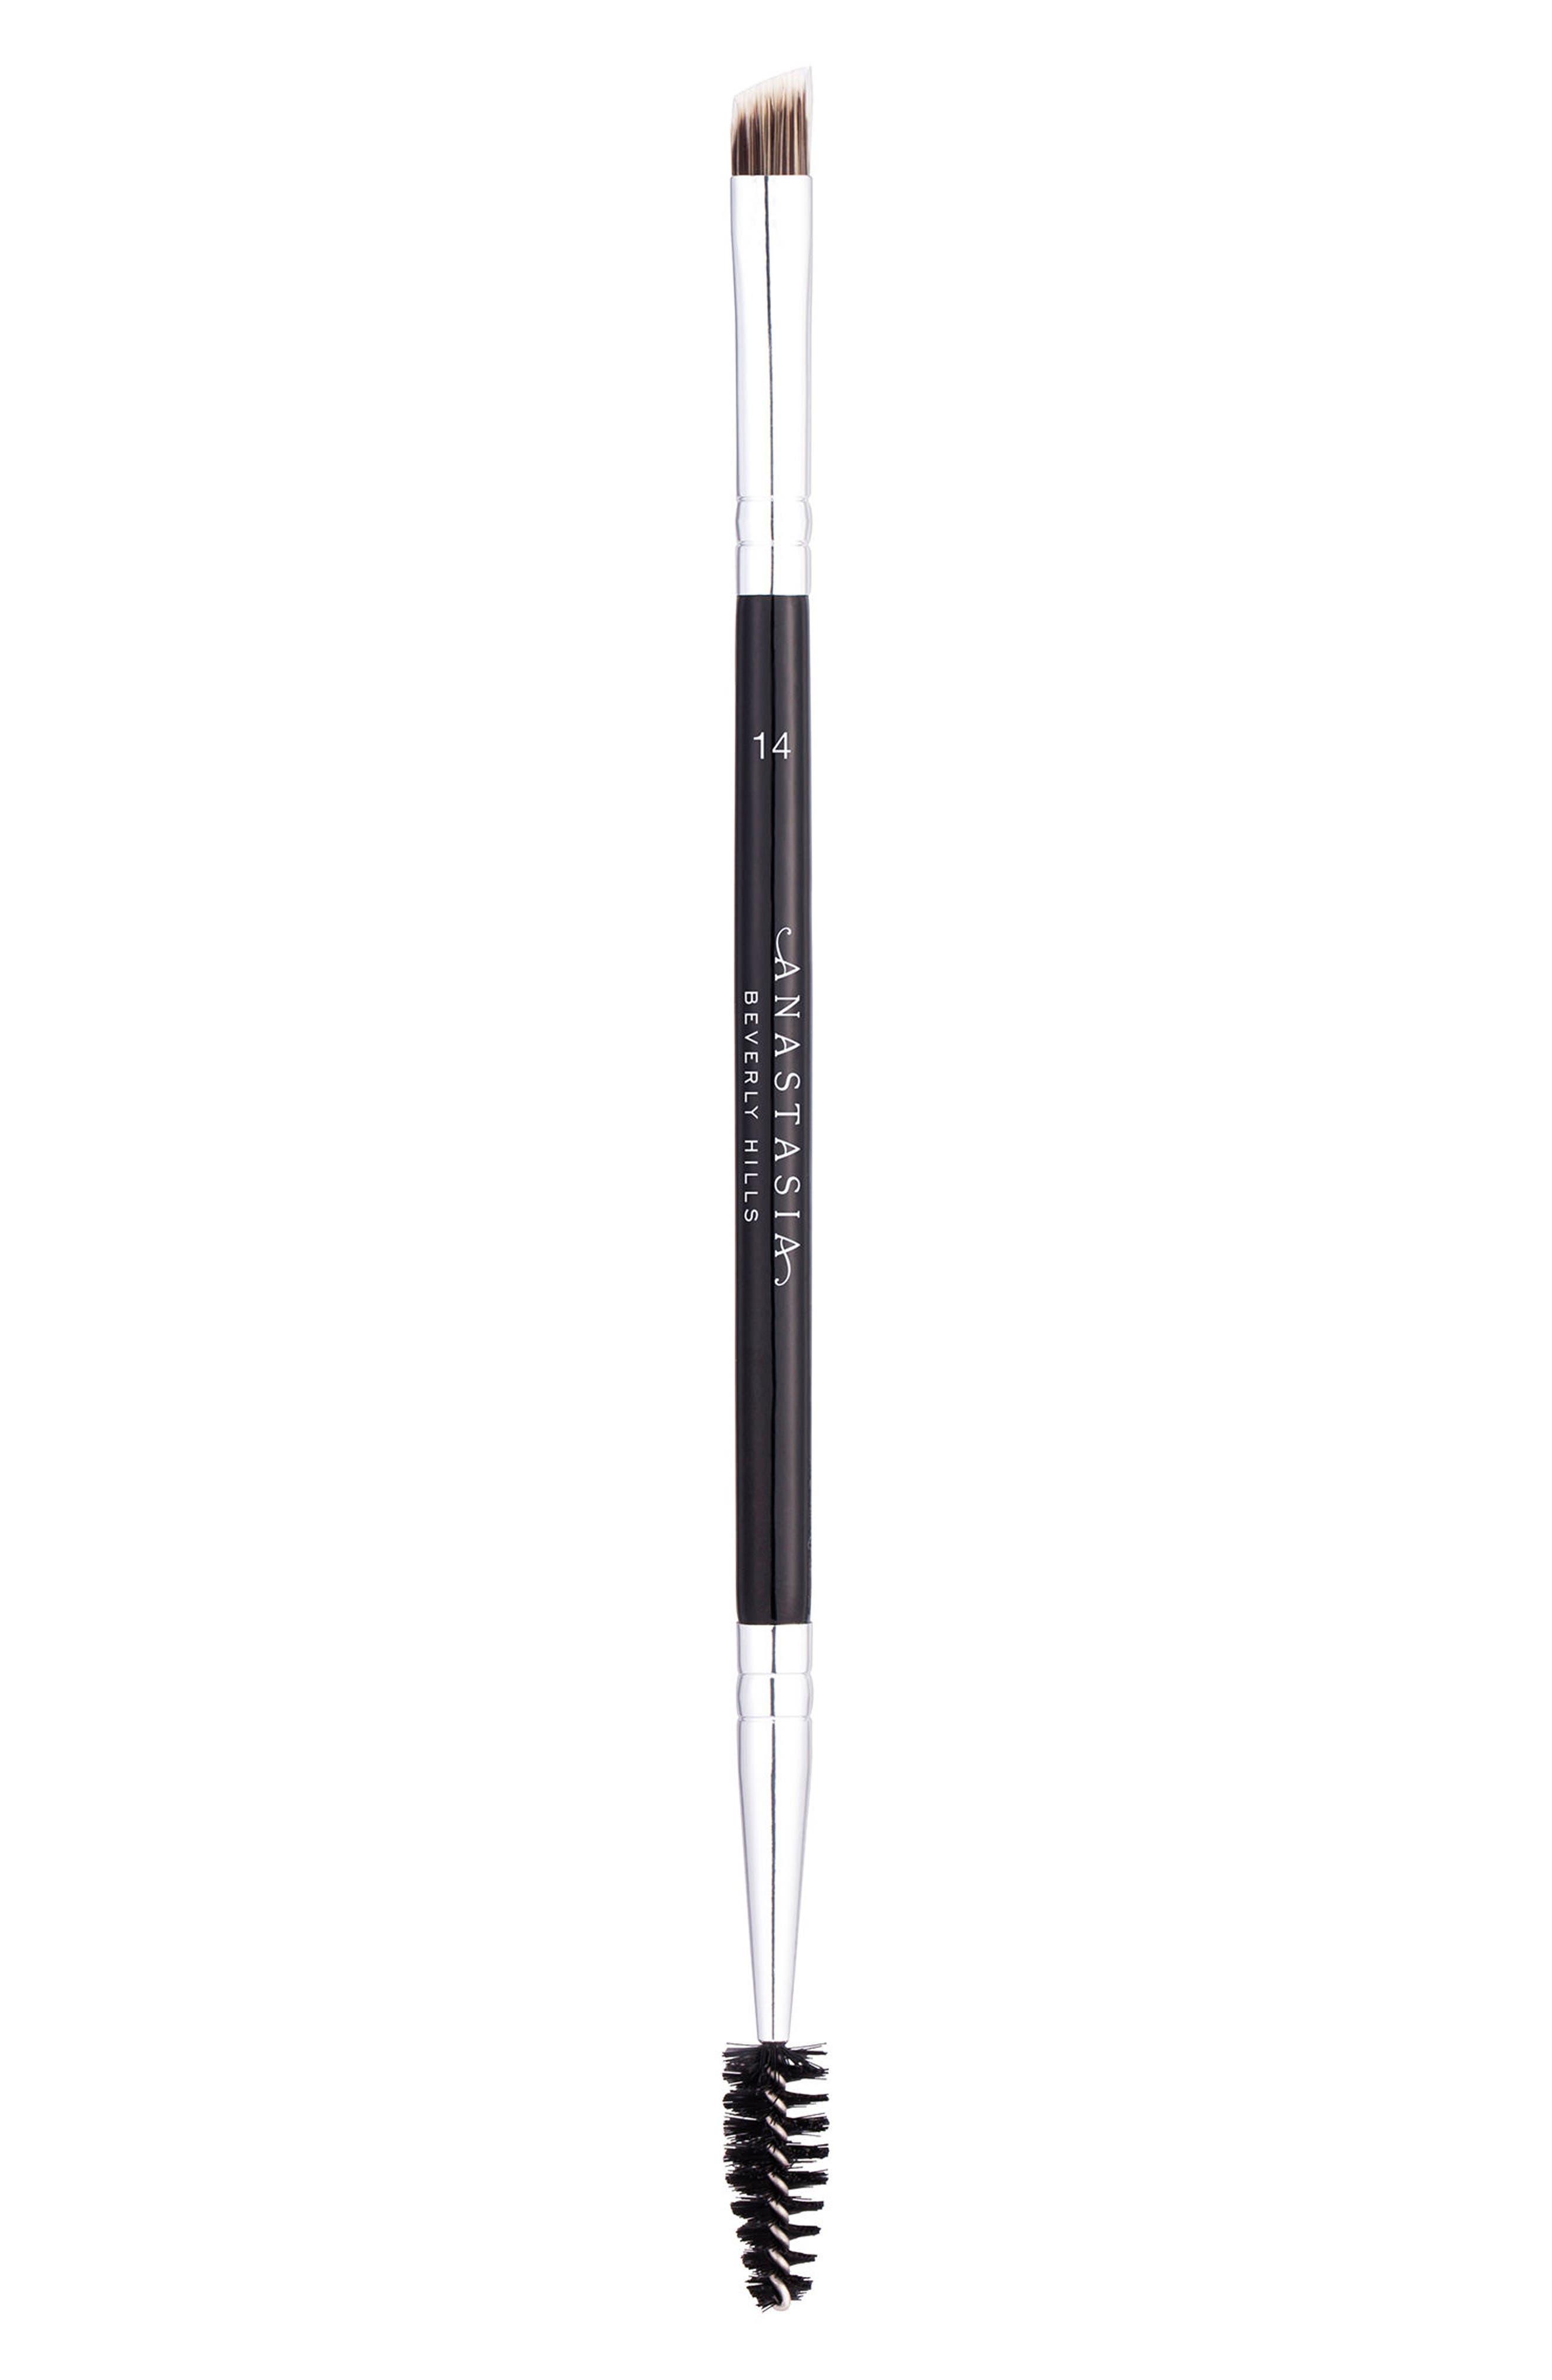 #14 Dual-Sided Brow & Eyeliner Brush,                             Main thumbnail 1, color,                             NO COLOR